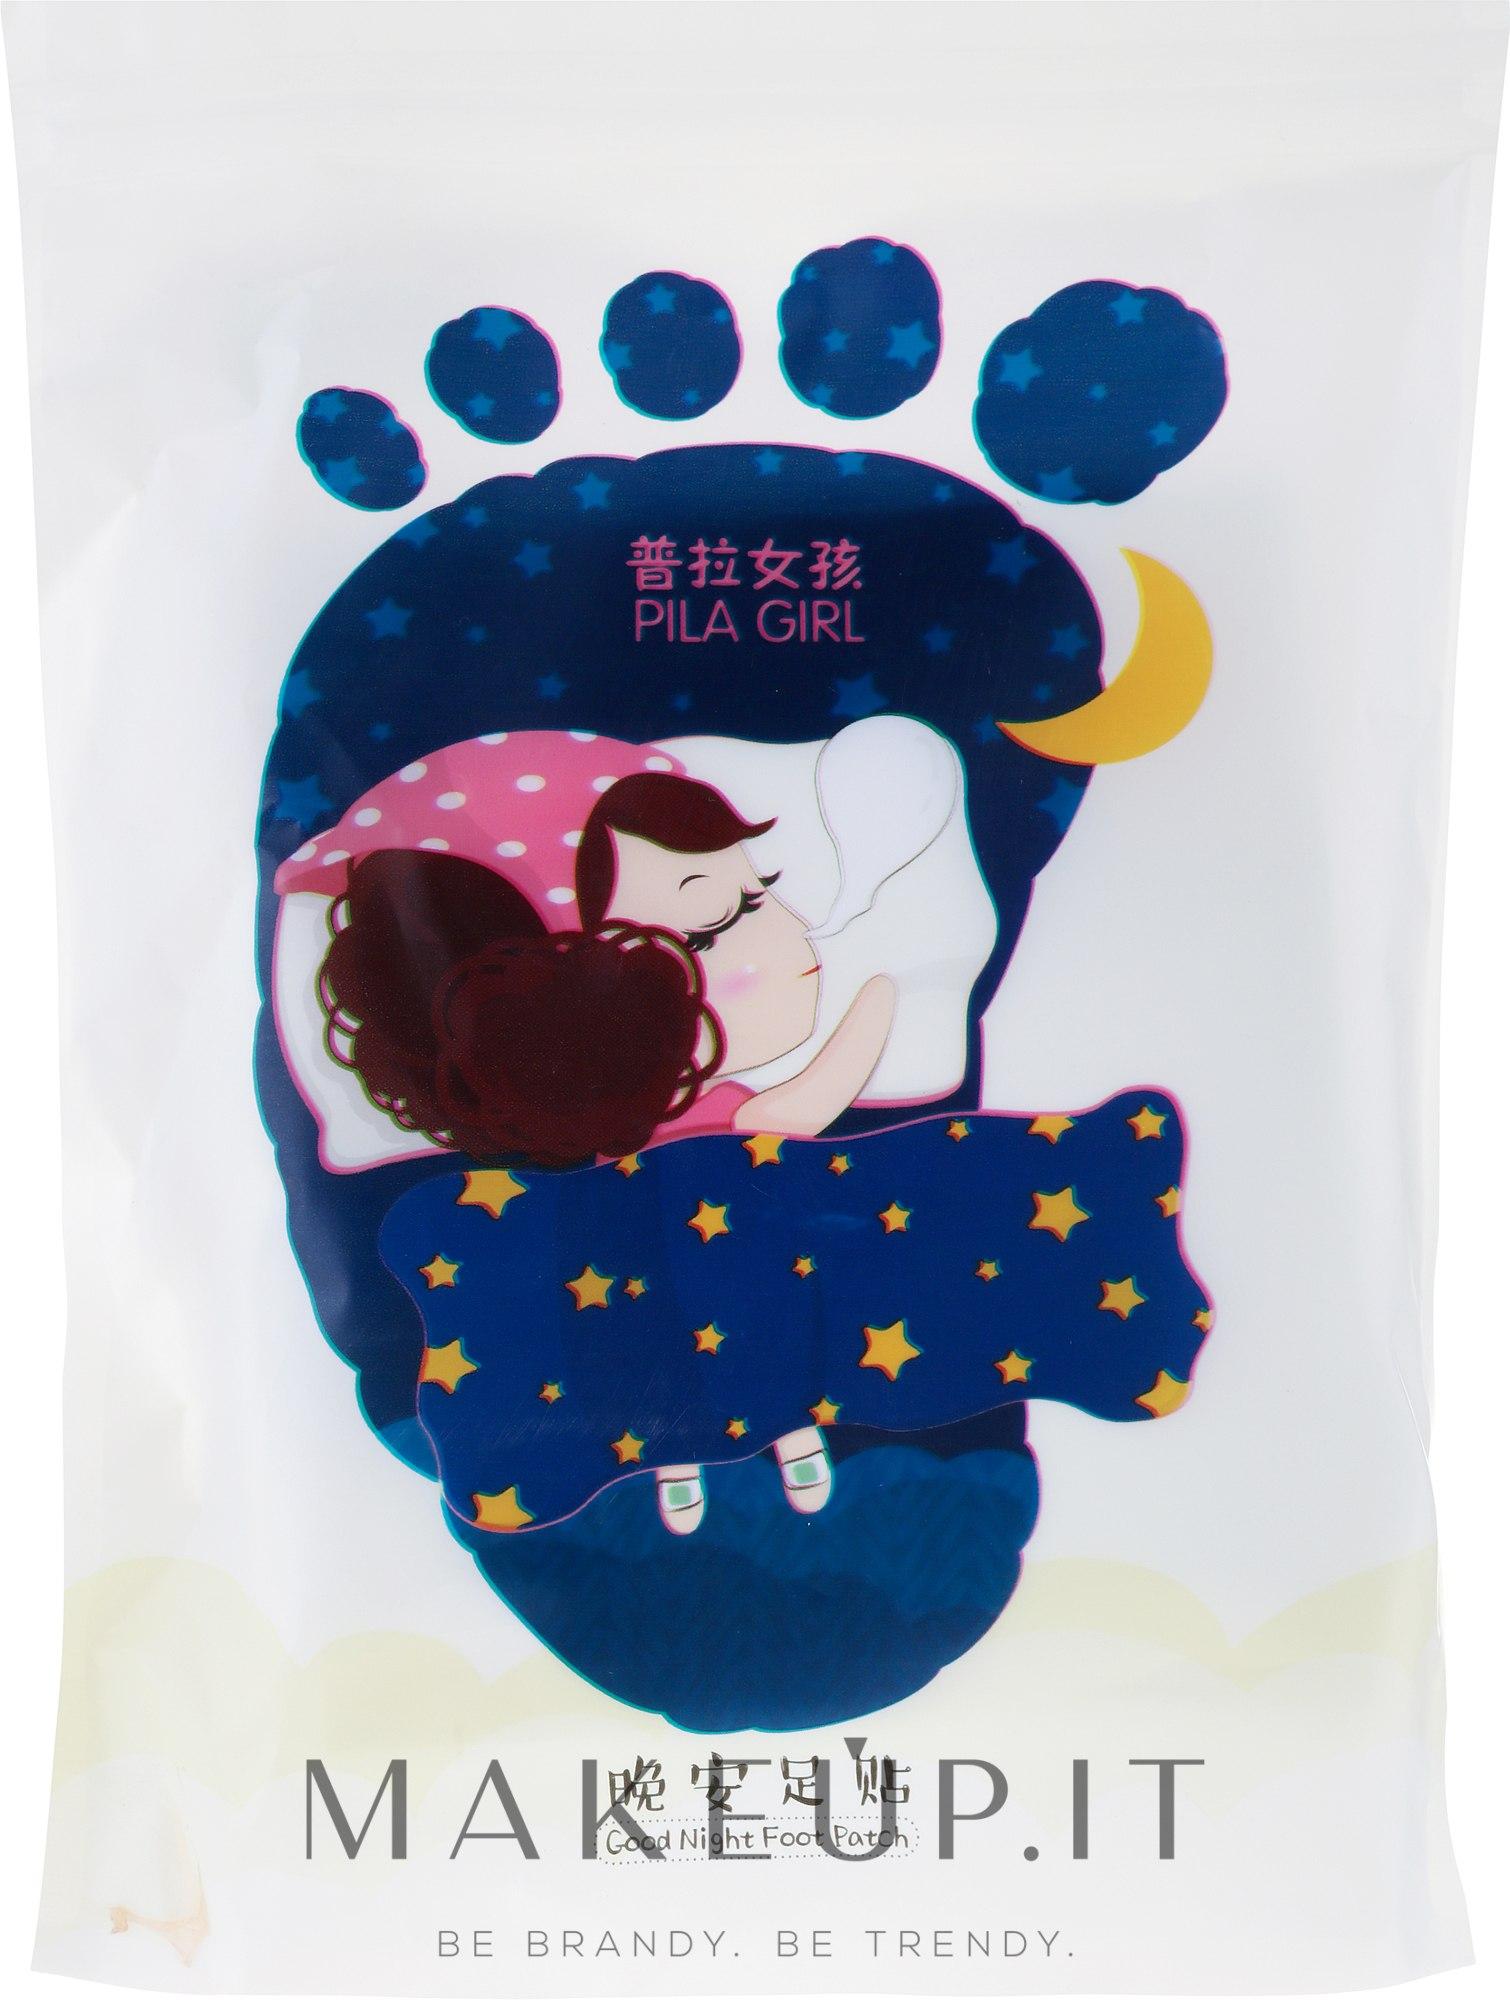 Trattamento detossinante patch piedi da notte - Pilaten Good Night Patch — foto 14 pz.